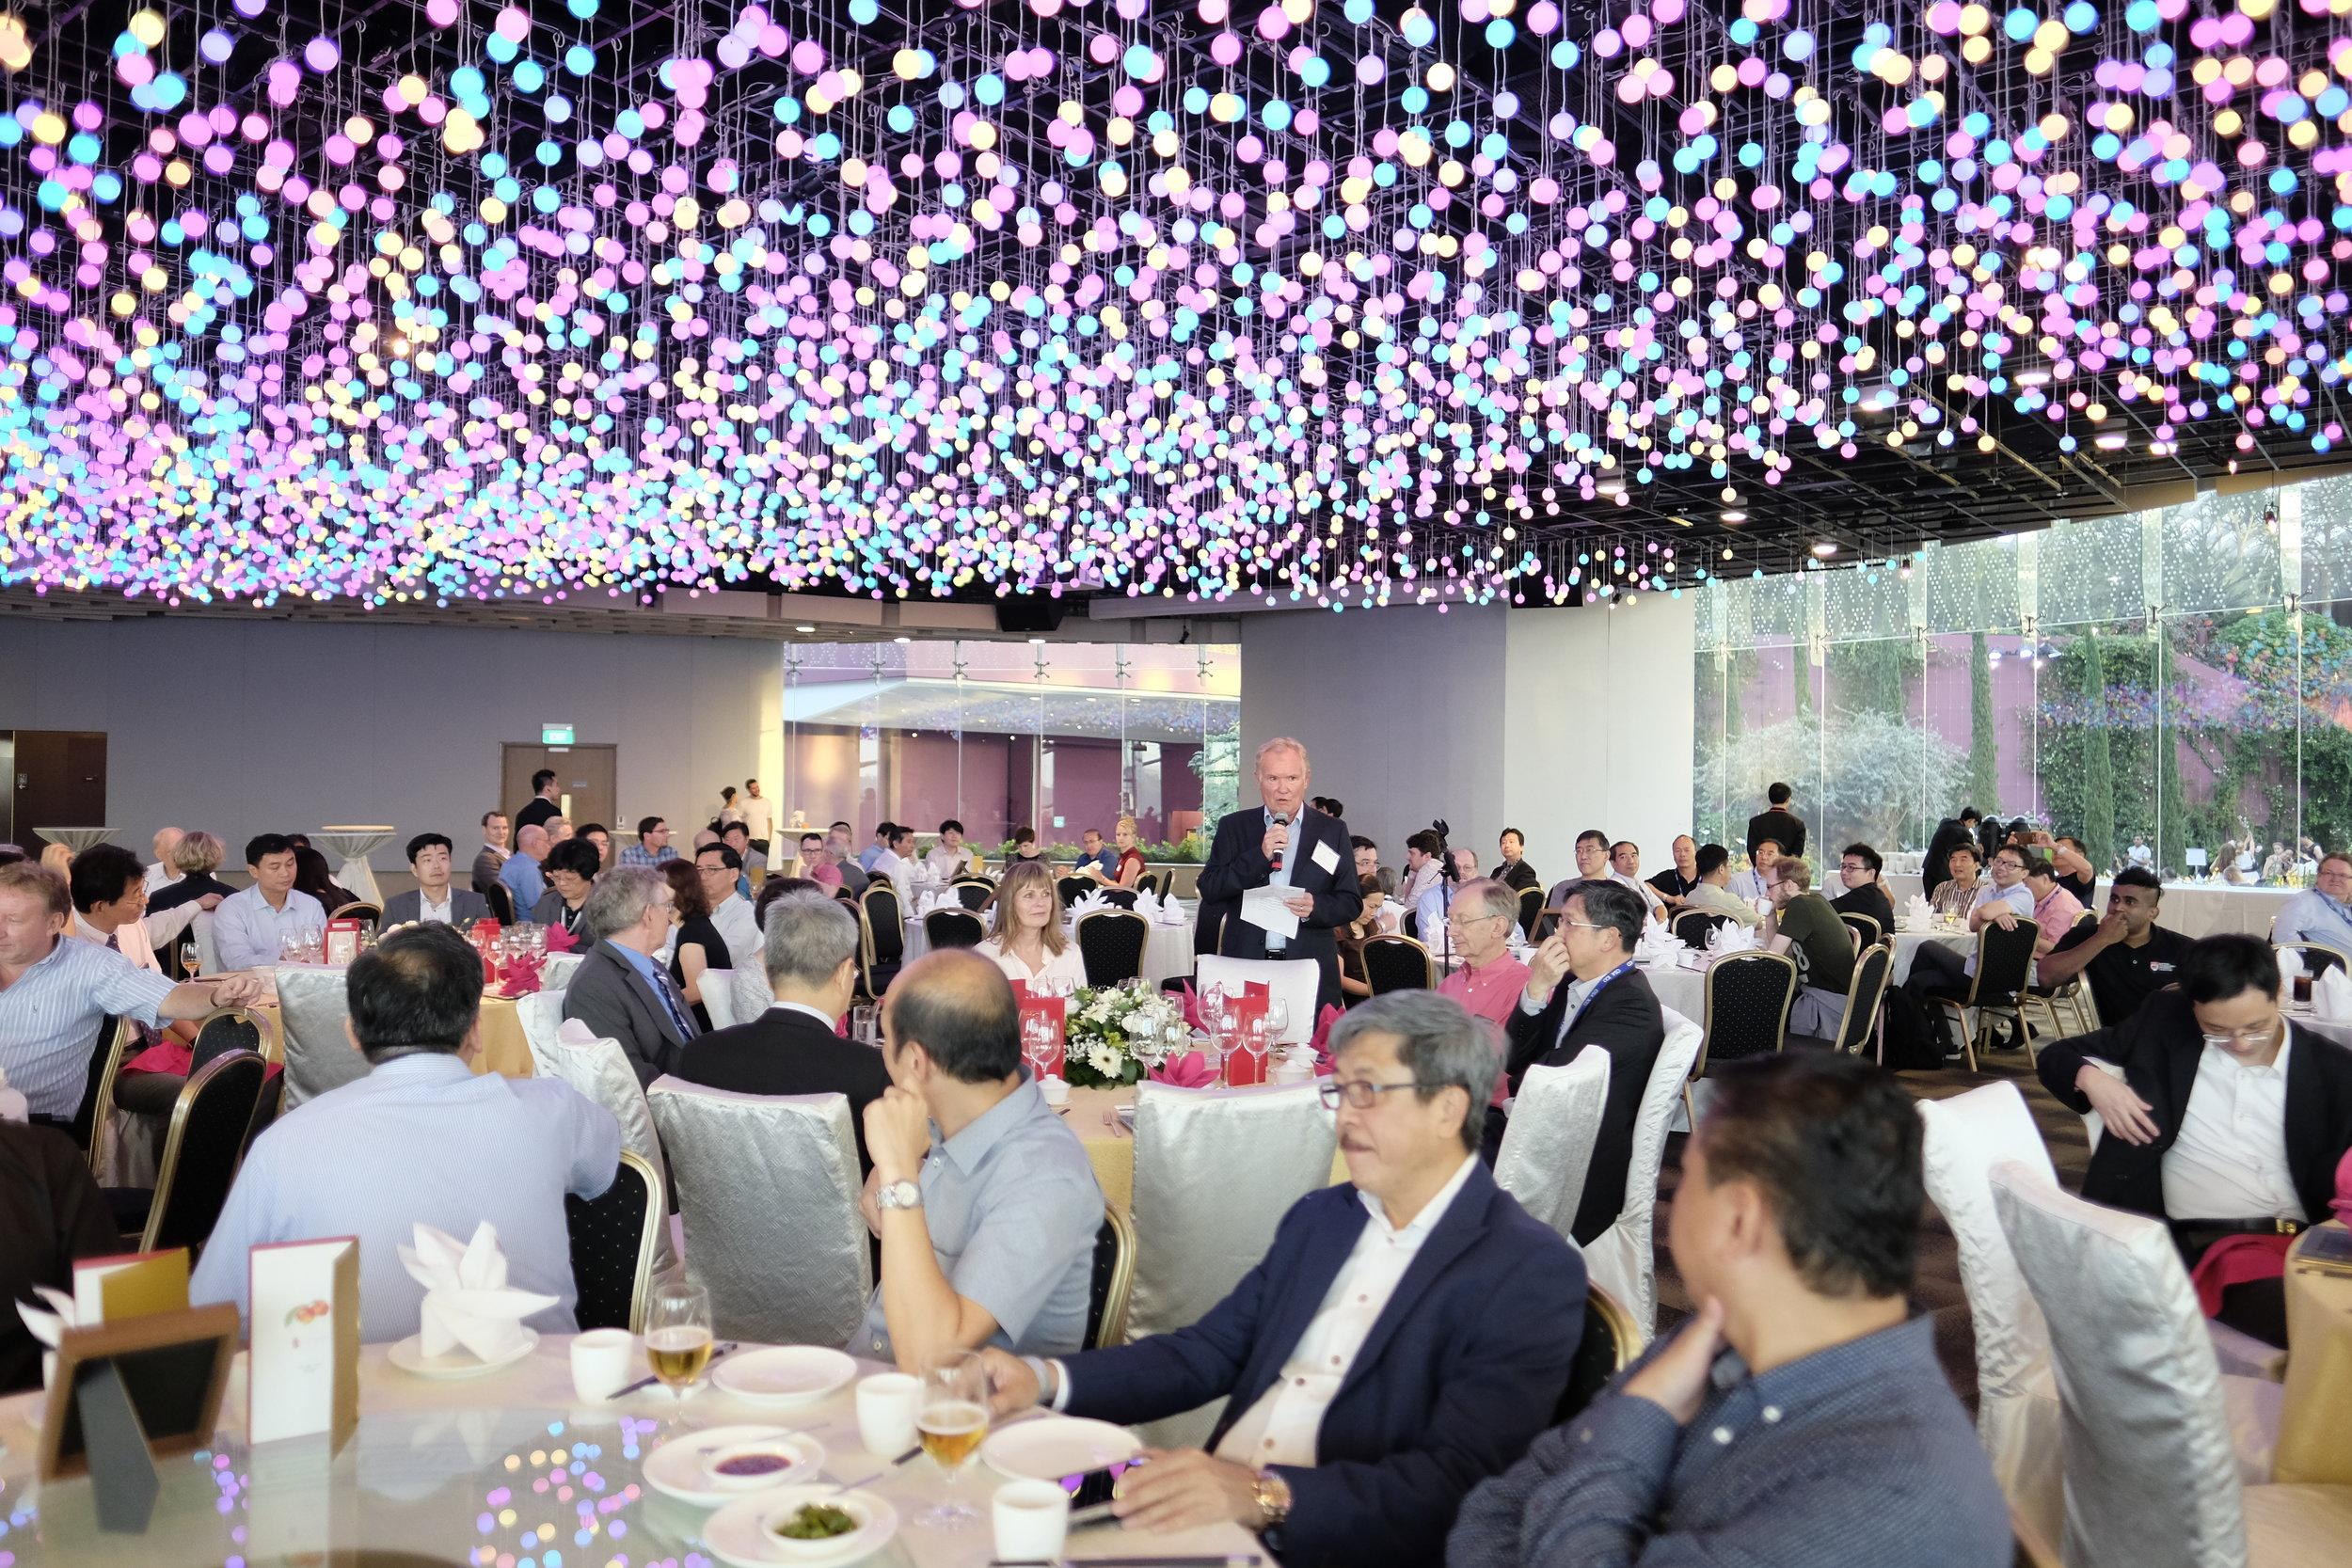 TPI VIP Reception Flower Dome 421wa.JPG